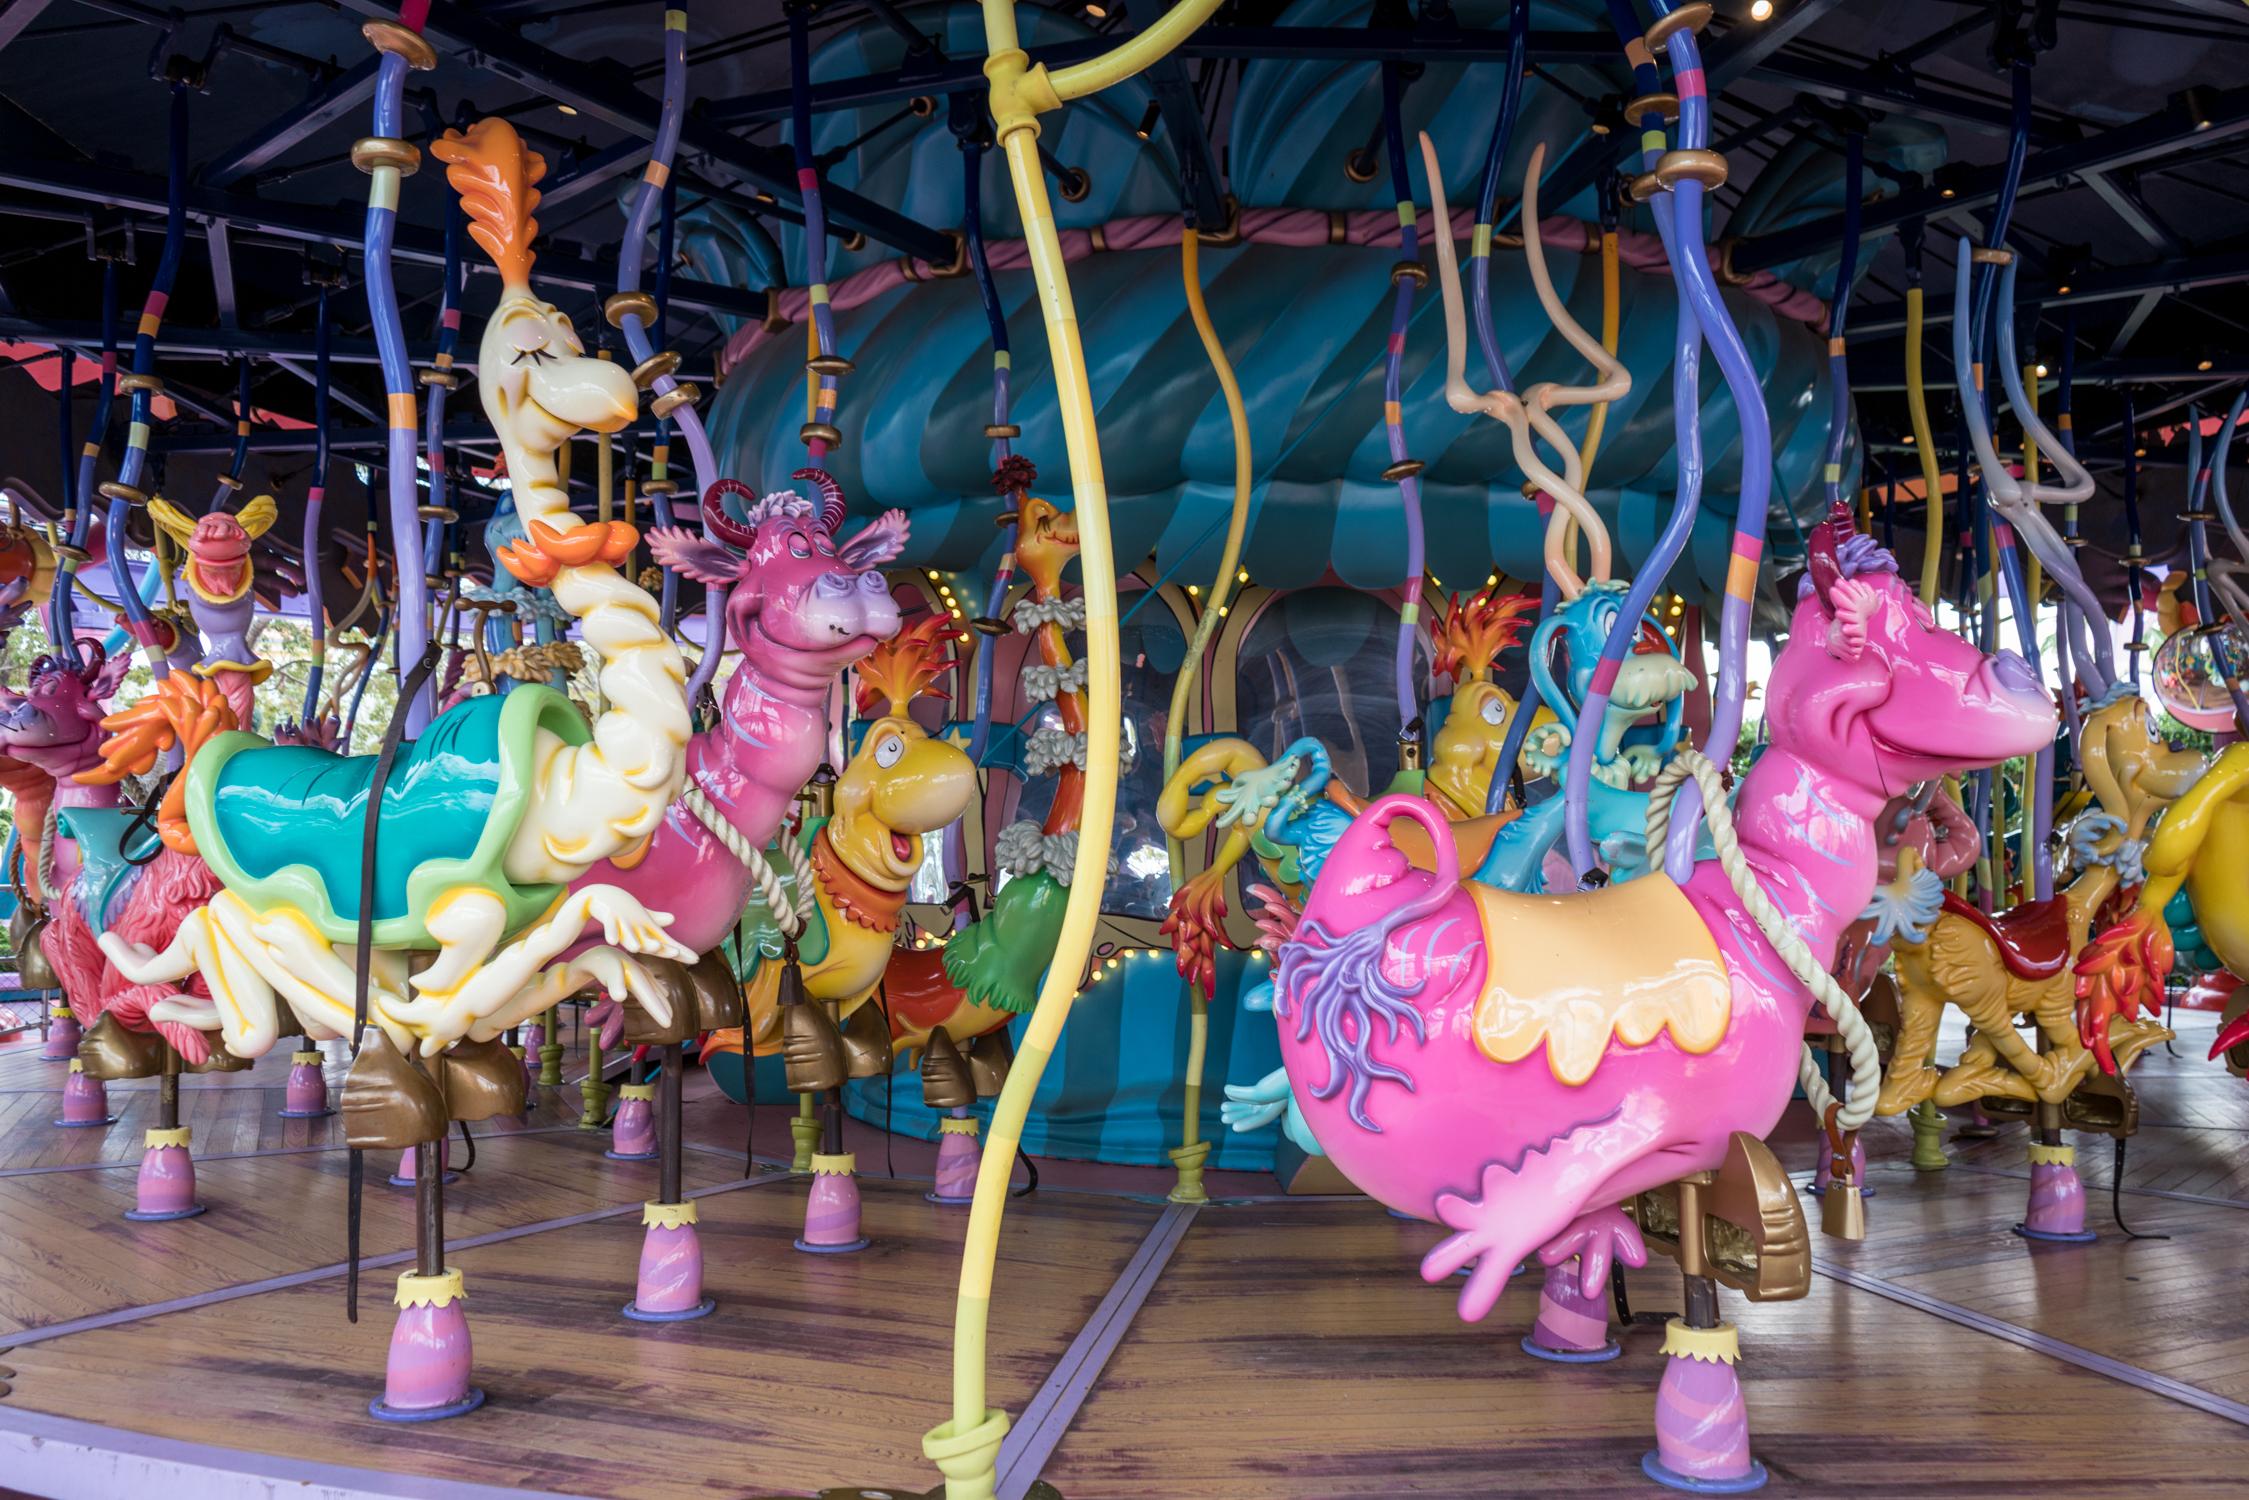 Caro-Seuss-el characters